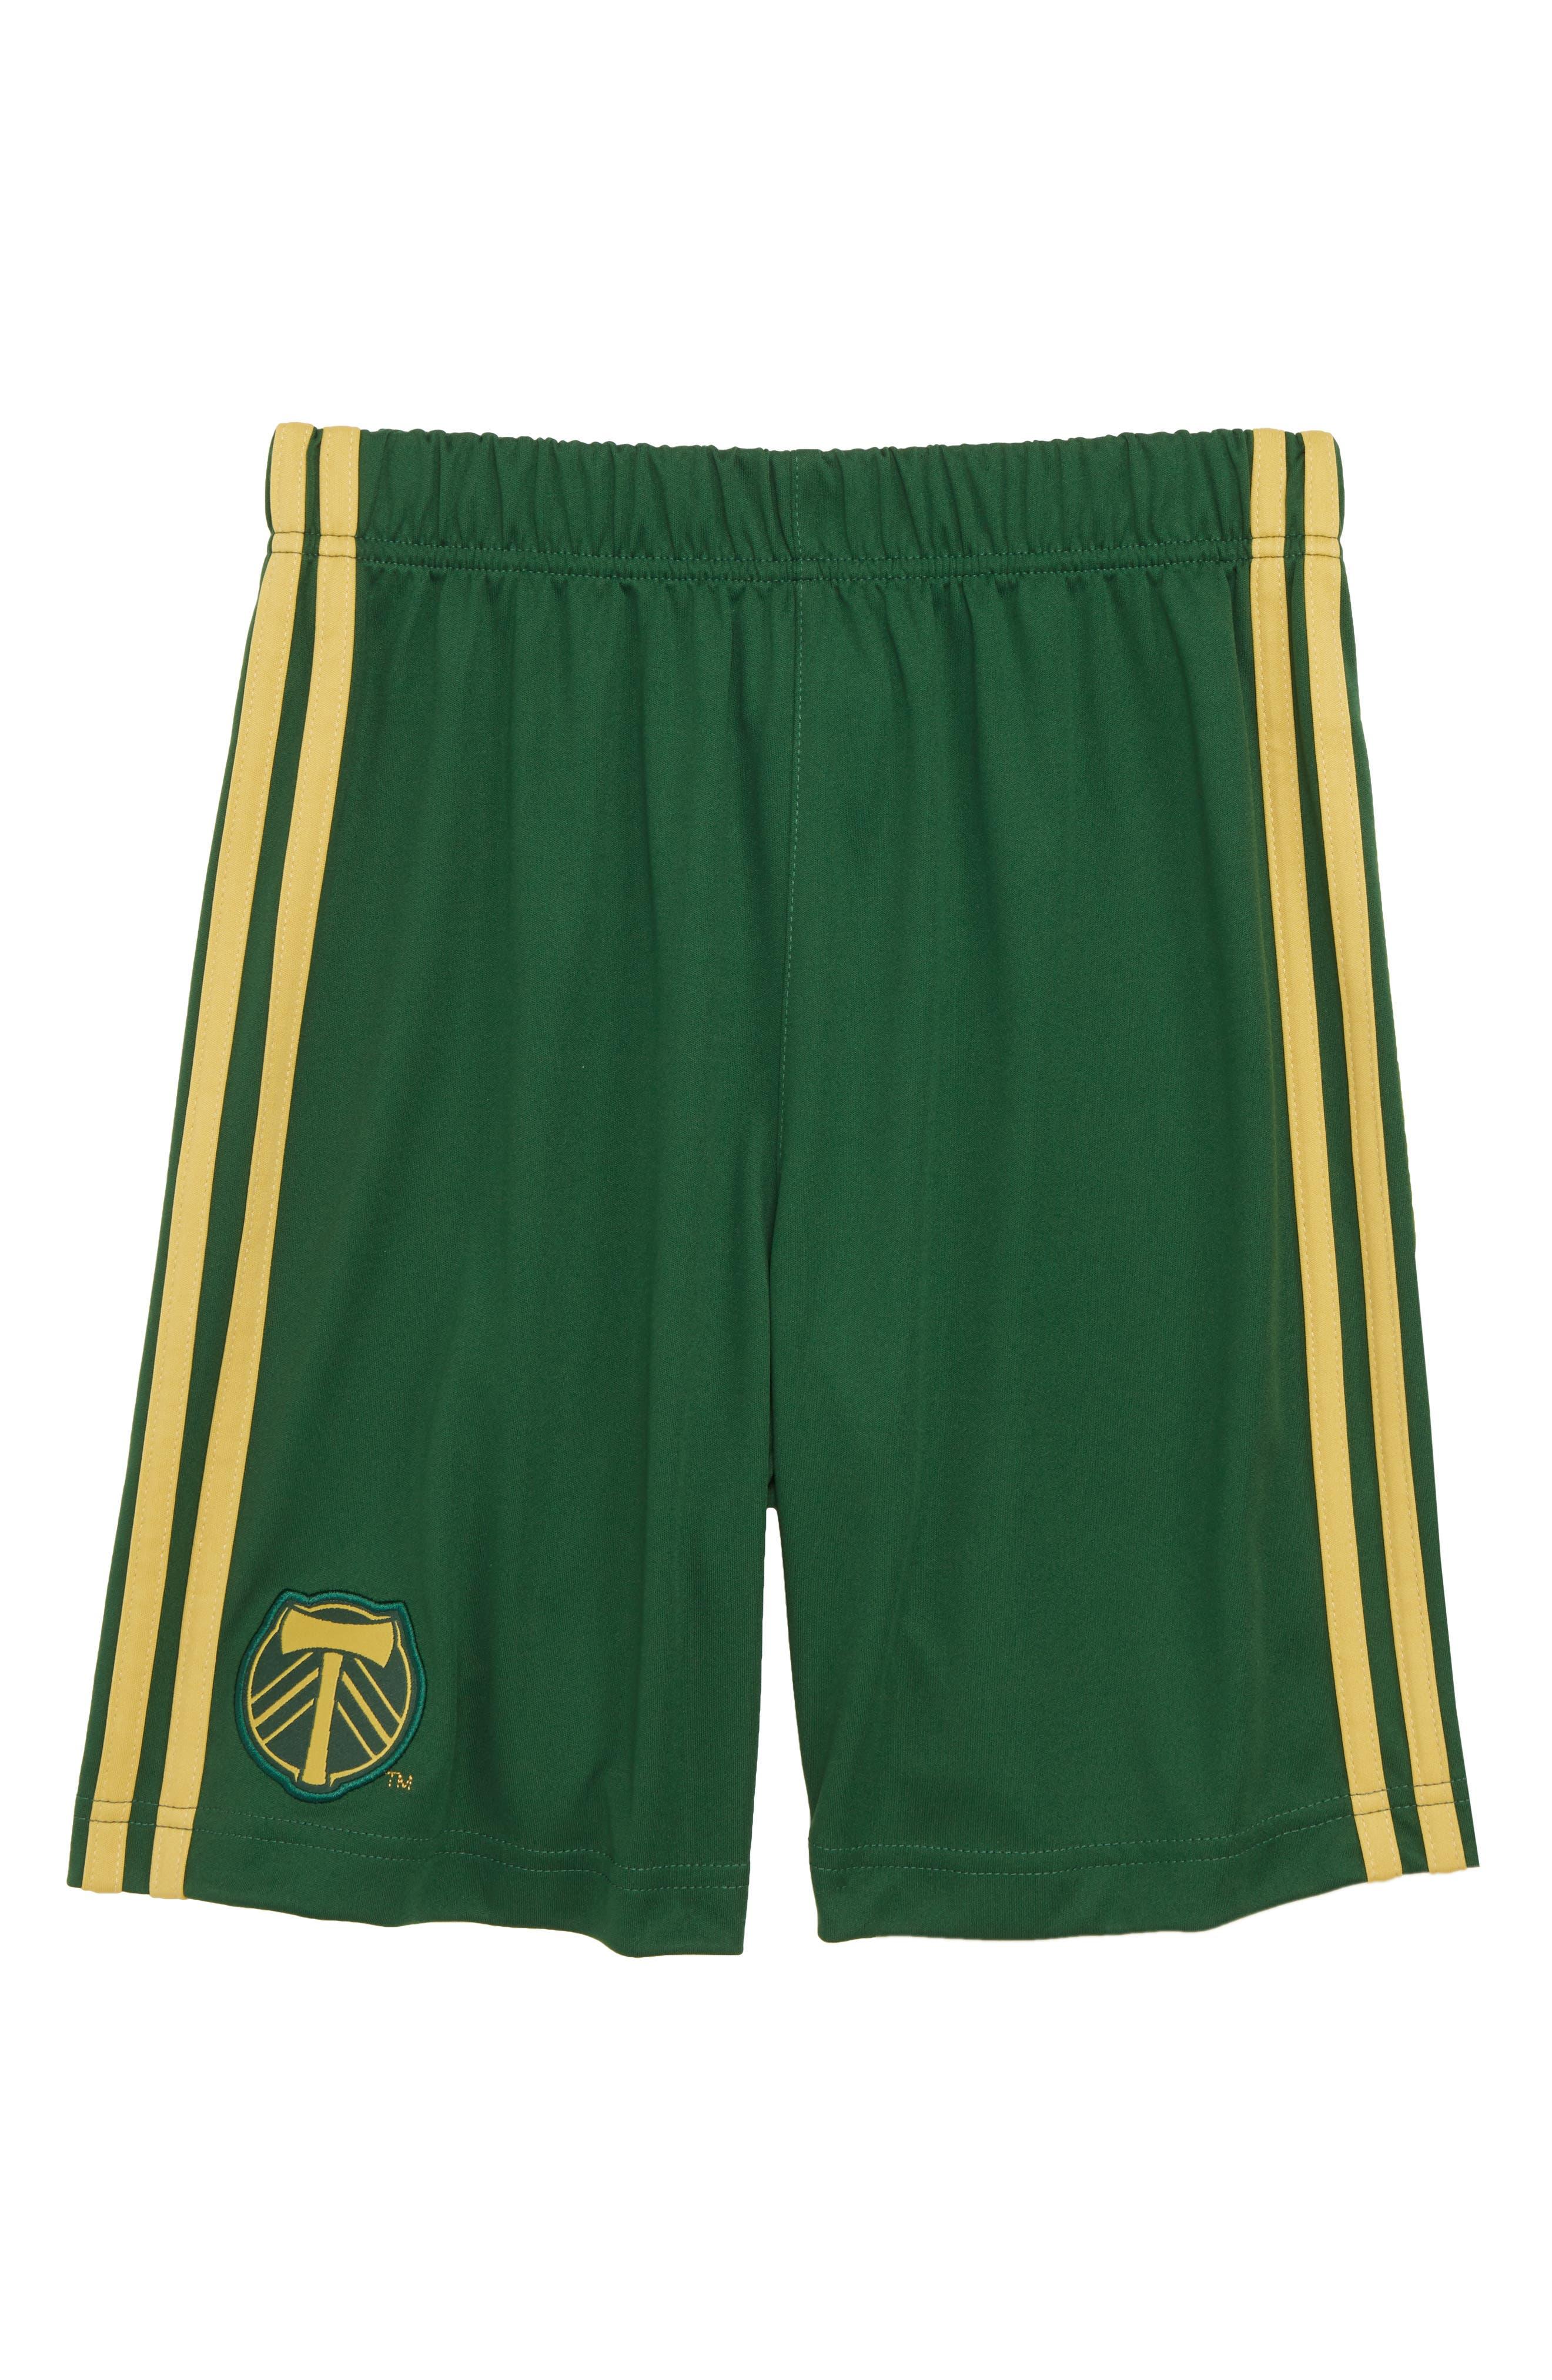 MLS Portland Timbers Shorts,                         Main,                         color, 300